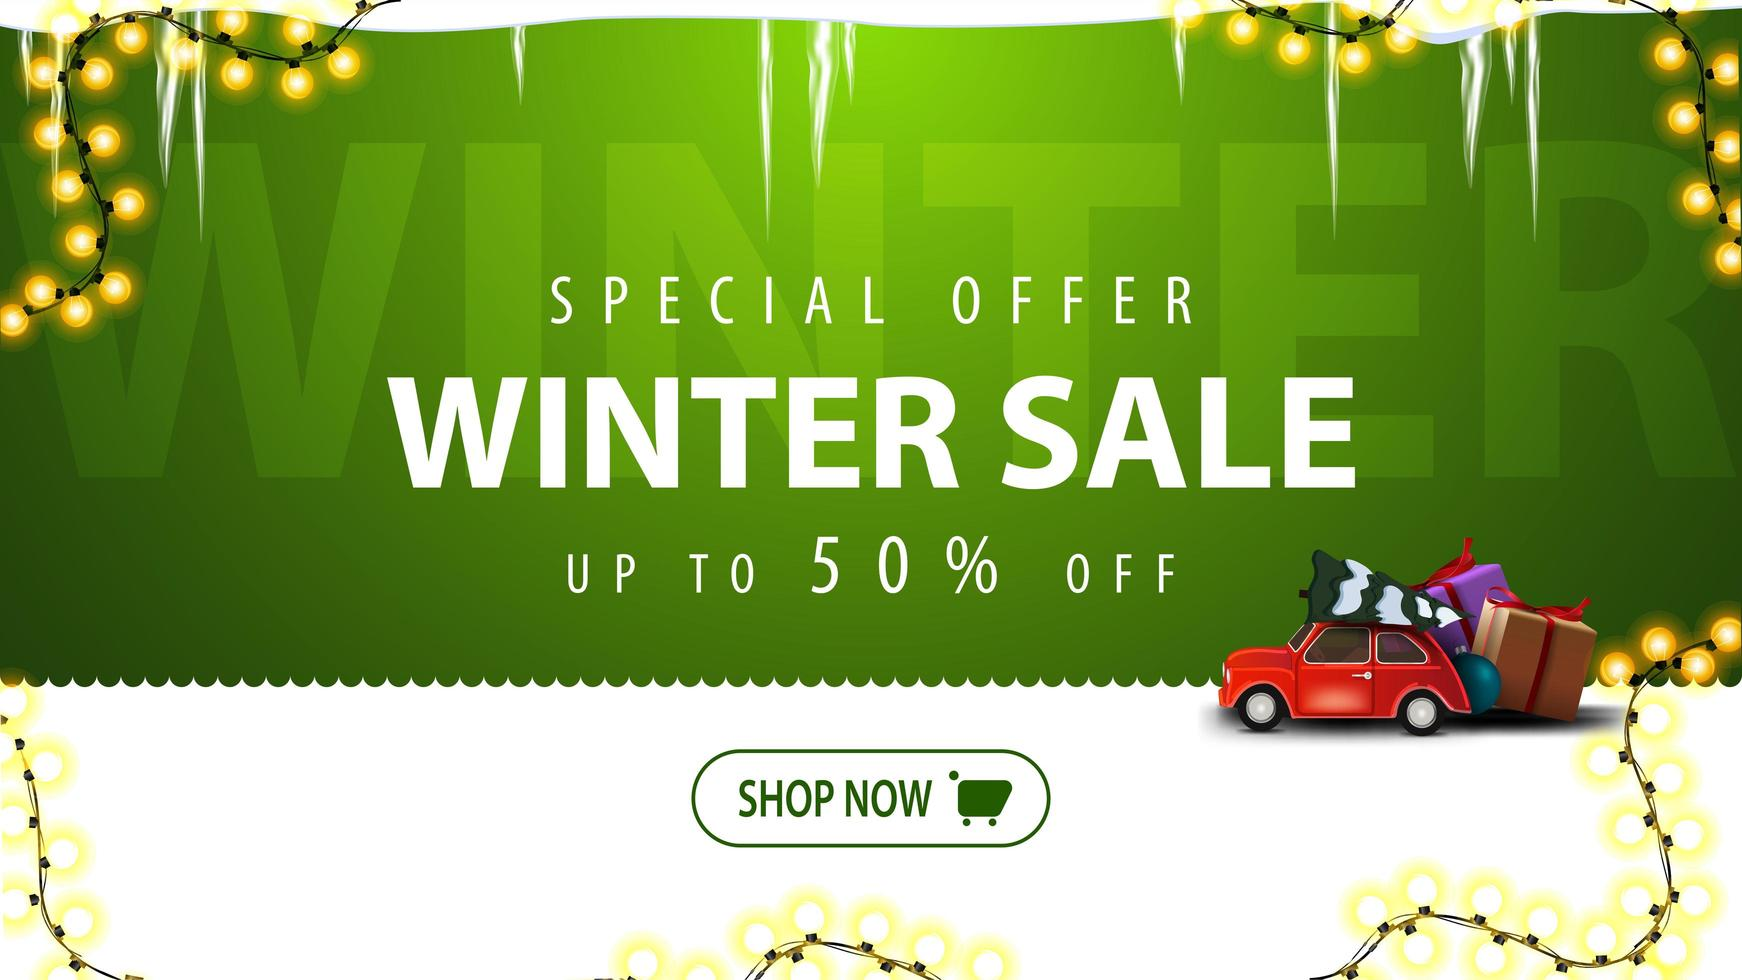 winteruitverkoop, groene kortingsbanner met knop vector